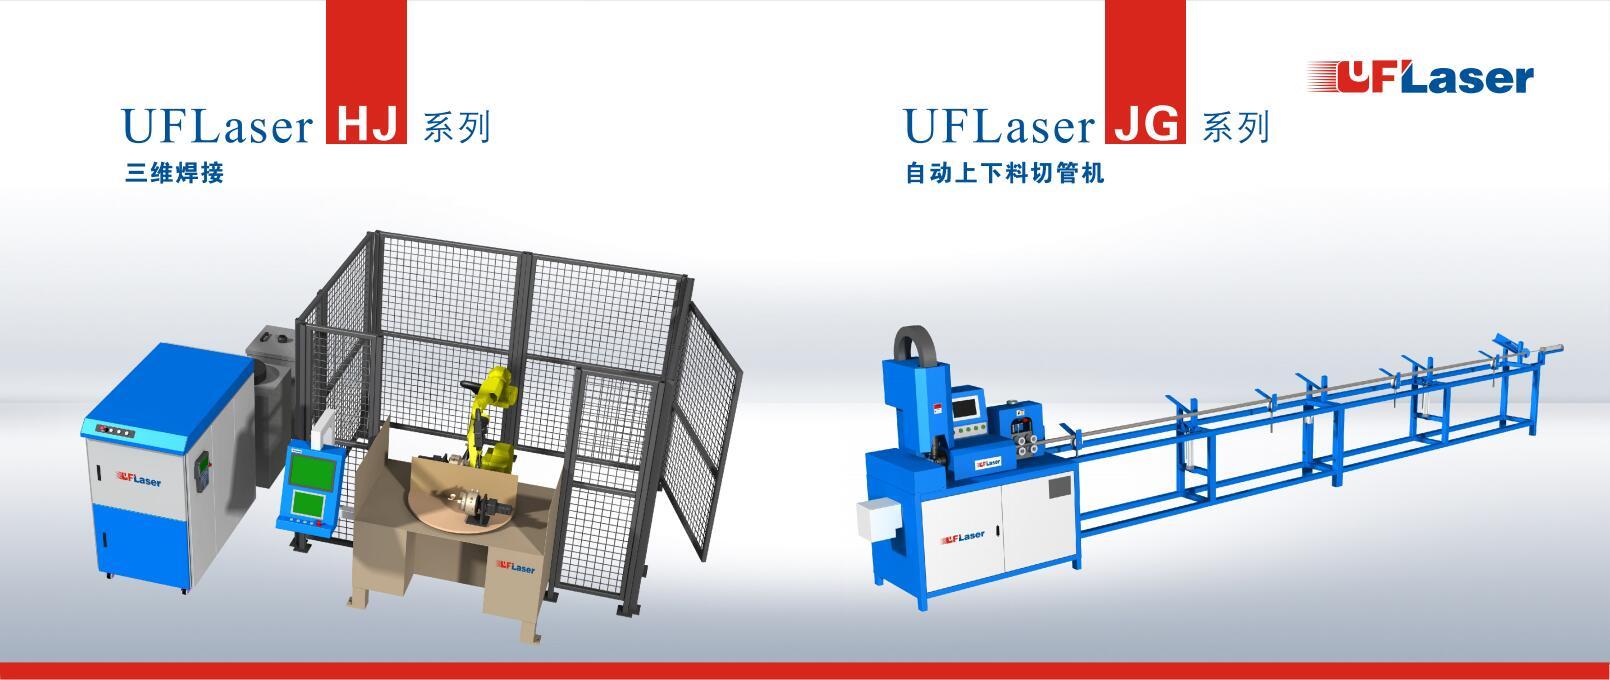 UFLaser非标 HJ-JH 系列